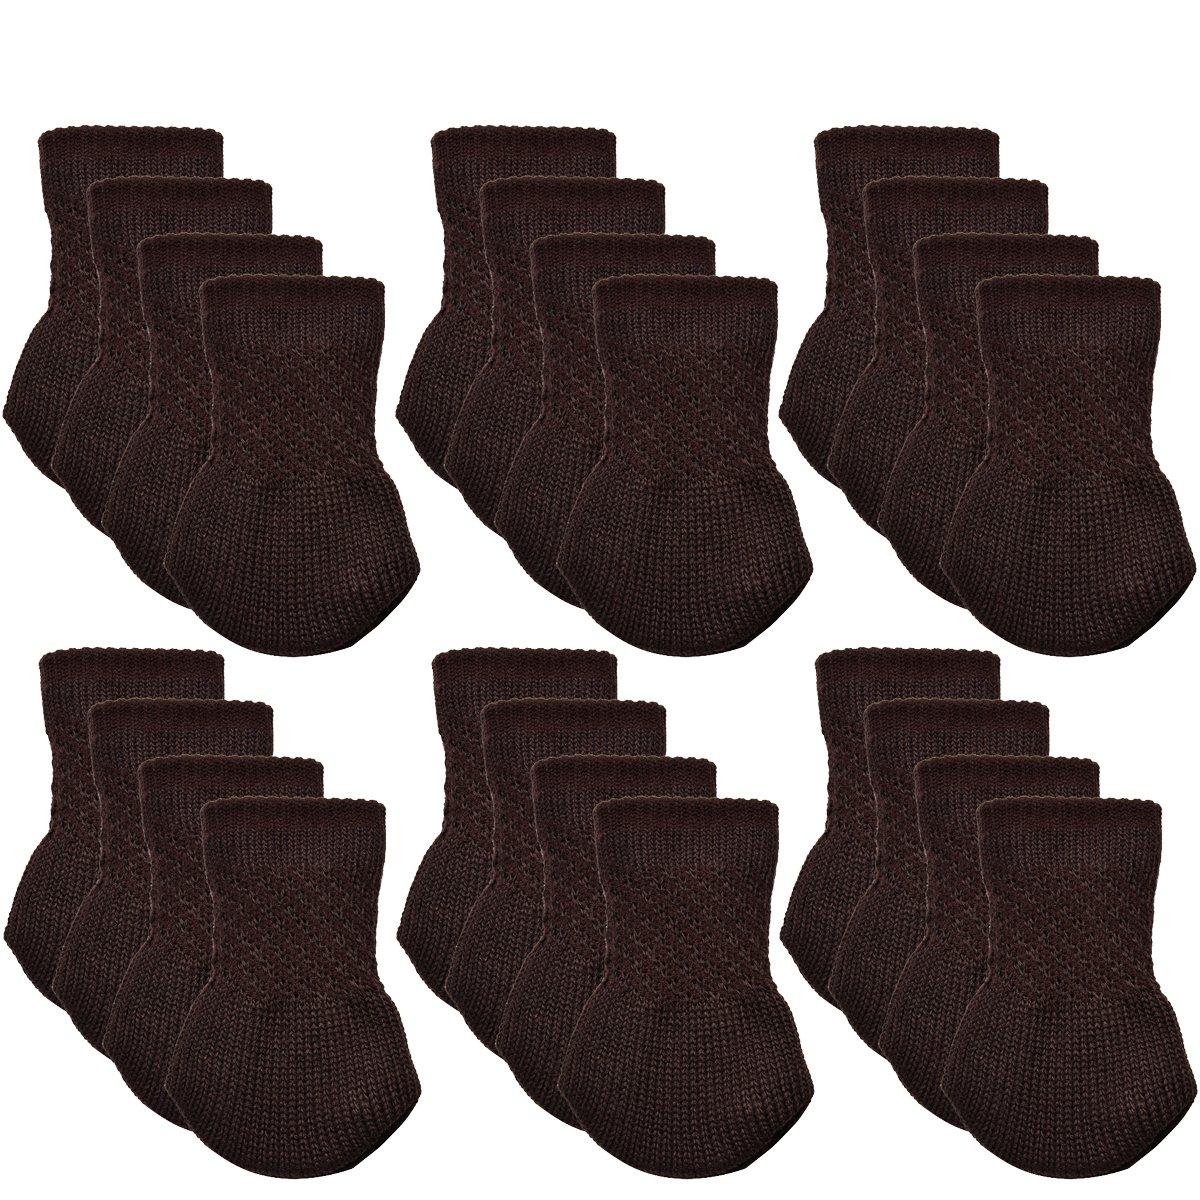 Furniture Socks & Chair Leg Floor Protector